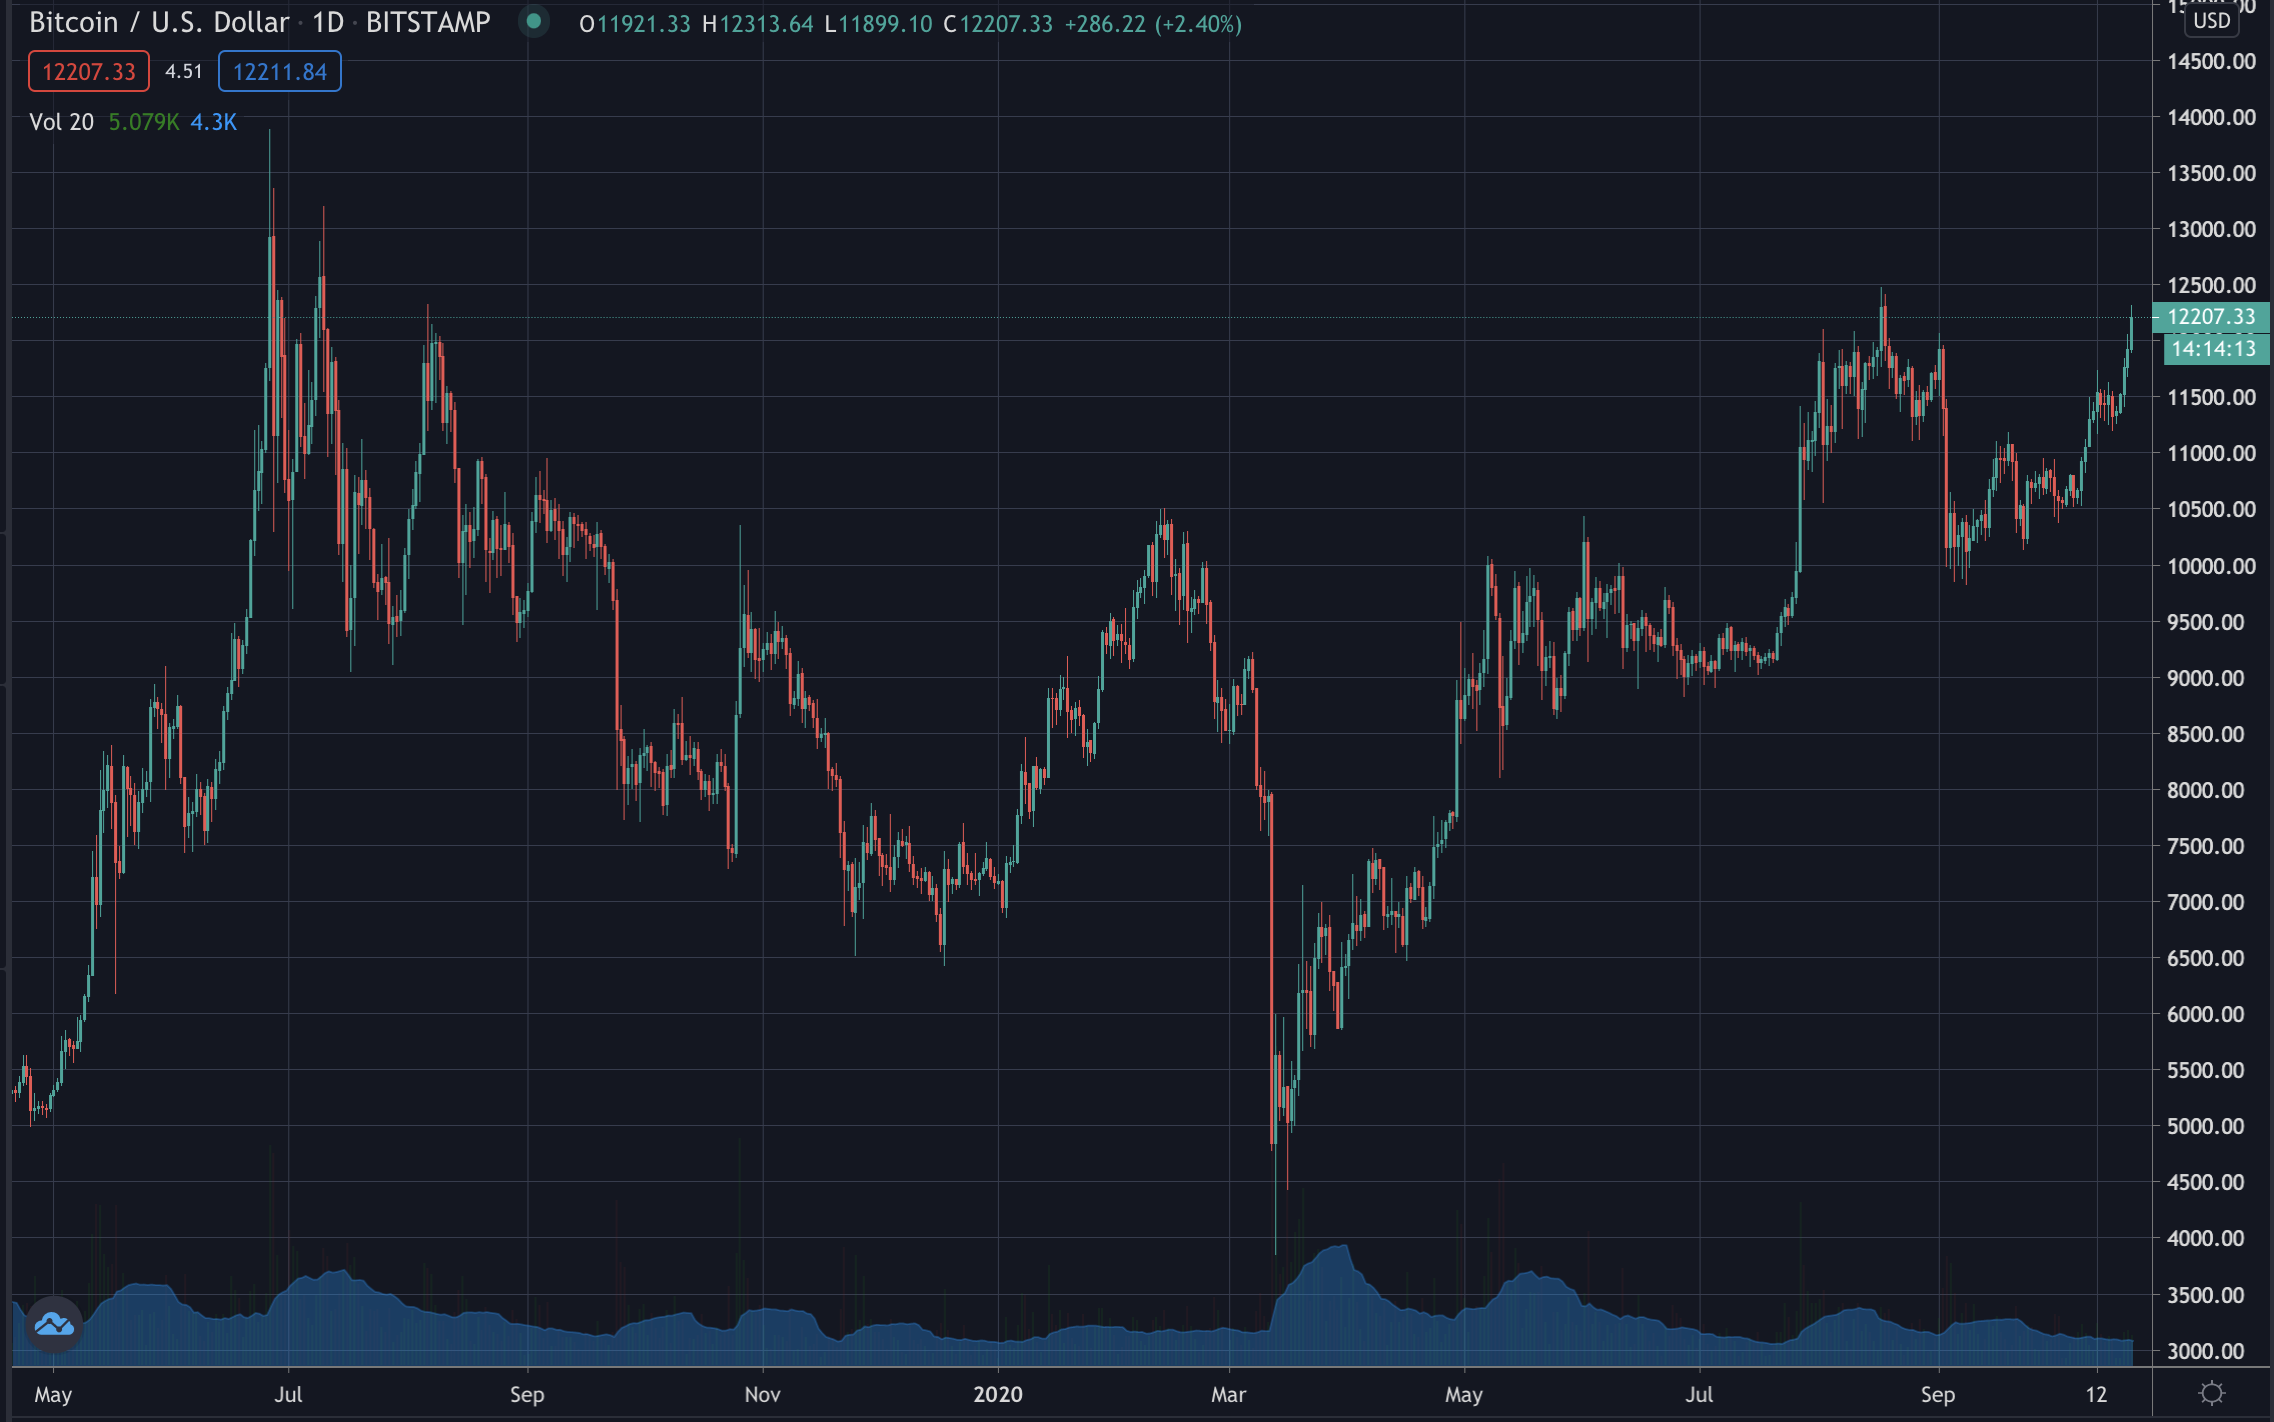 Bitcoin price, October 2020